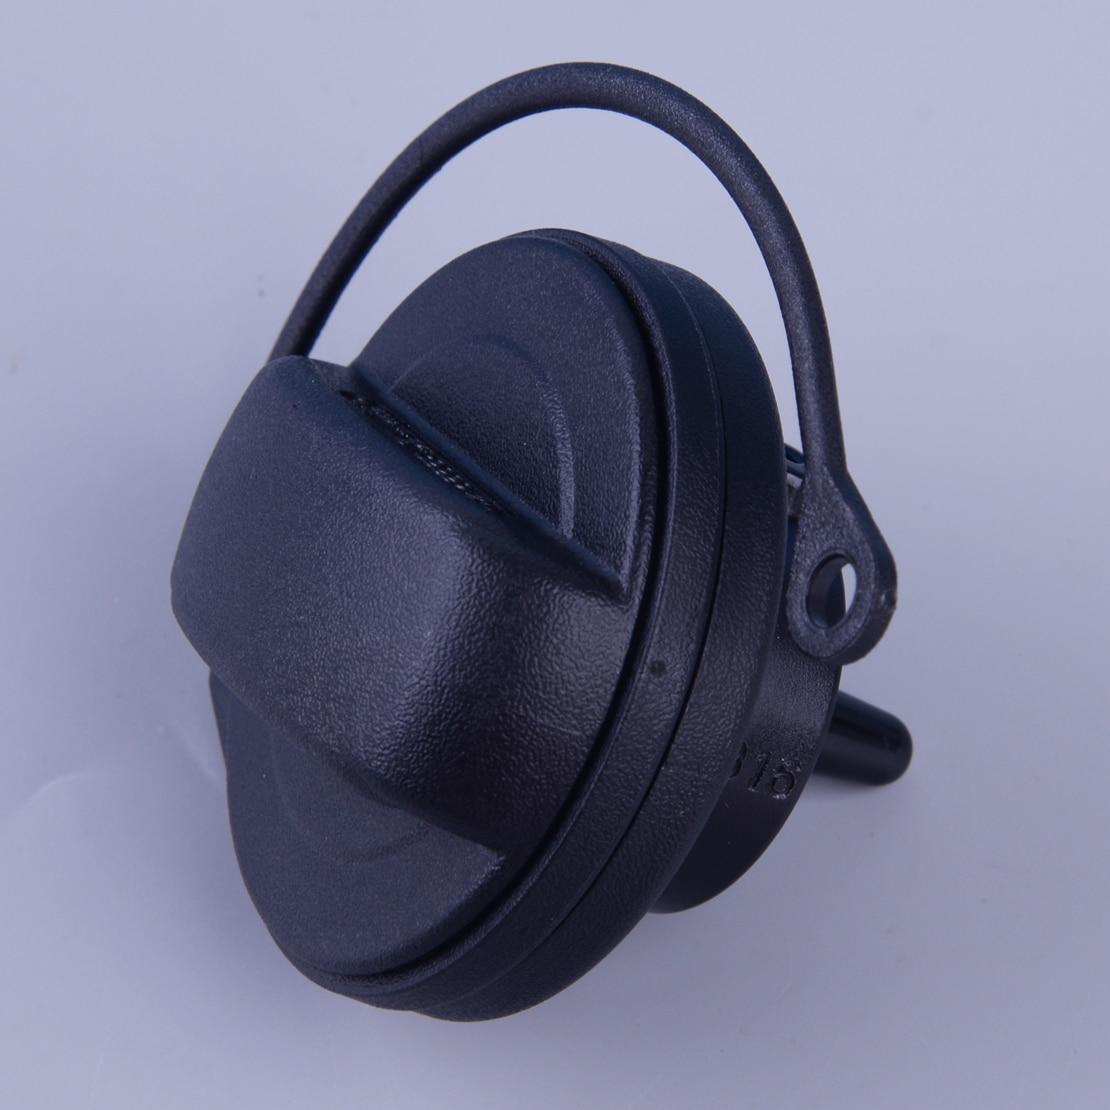 Beler de Gas de combustible de plástico negro tapa del tanque de accesorios aptos para VW Tiguan Passat EOS 3C0201550 2008, 2009, 2010, 2011